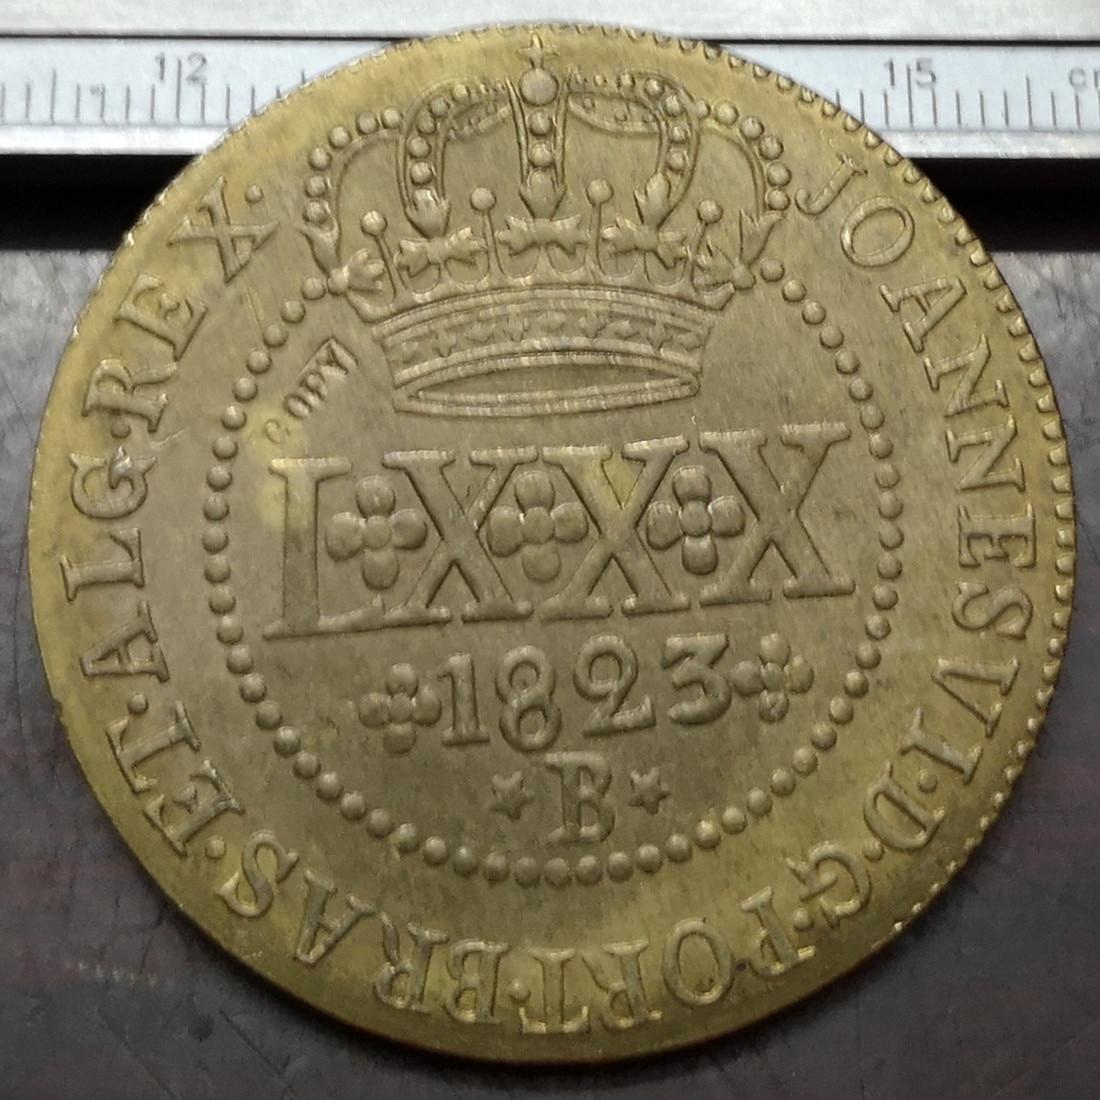 Brazil 1 Centavo coin 1975 km585 South America UNC coin